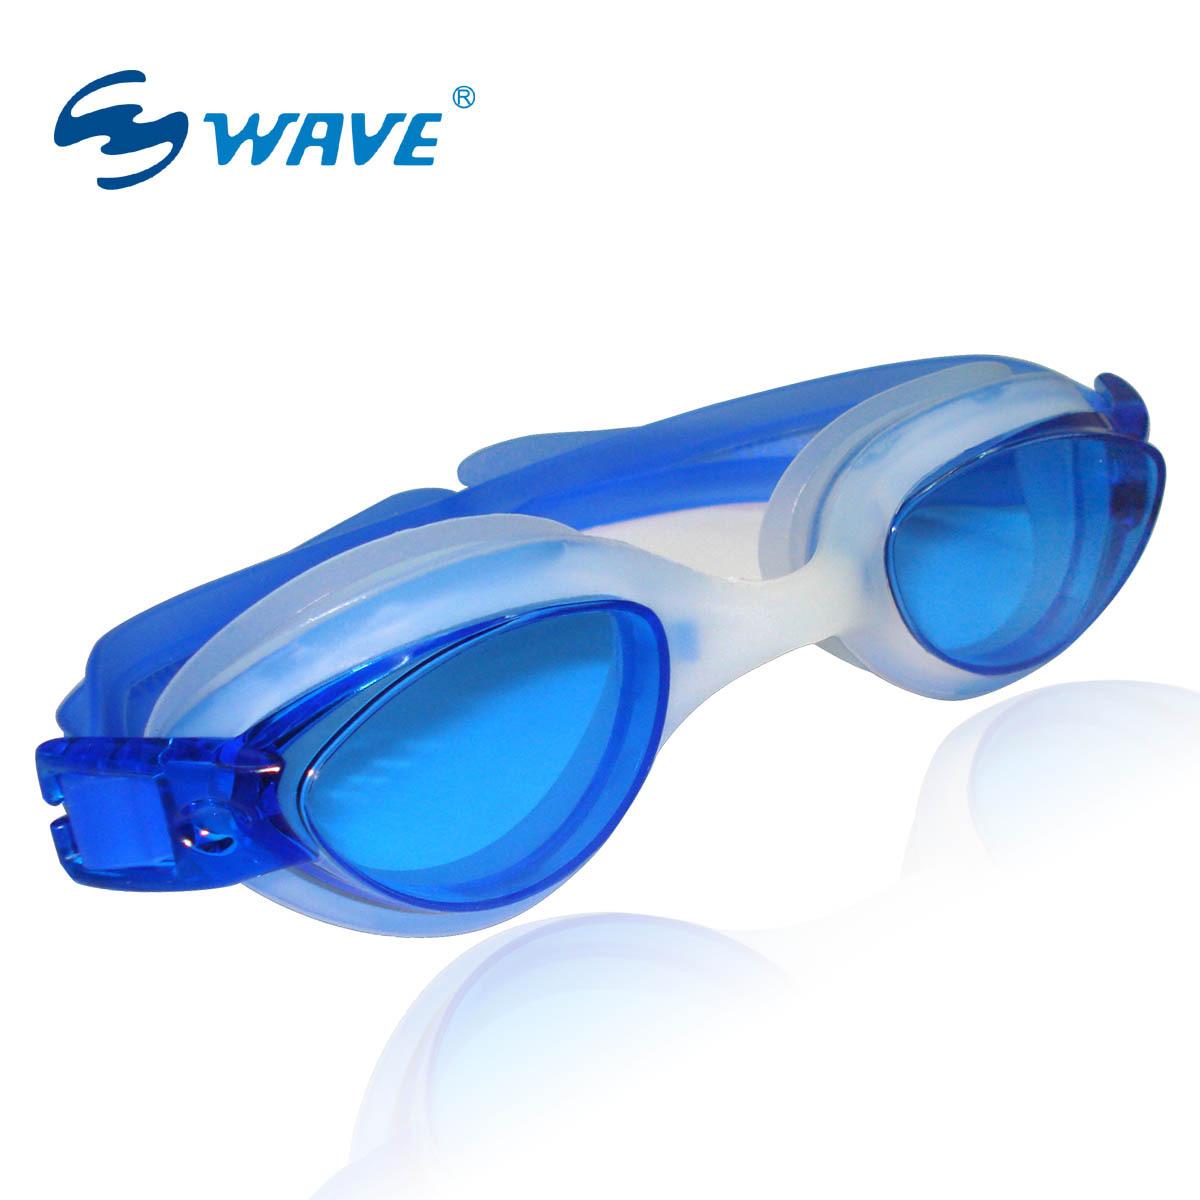 Очки для плавания WAVE ( waves Licensing) ga2393 WAVE( Очки с защитой от запотевания